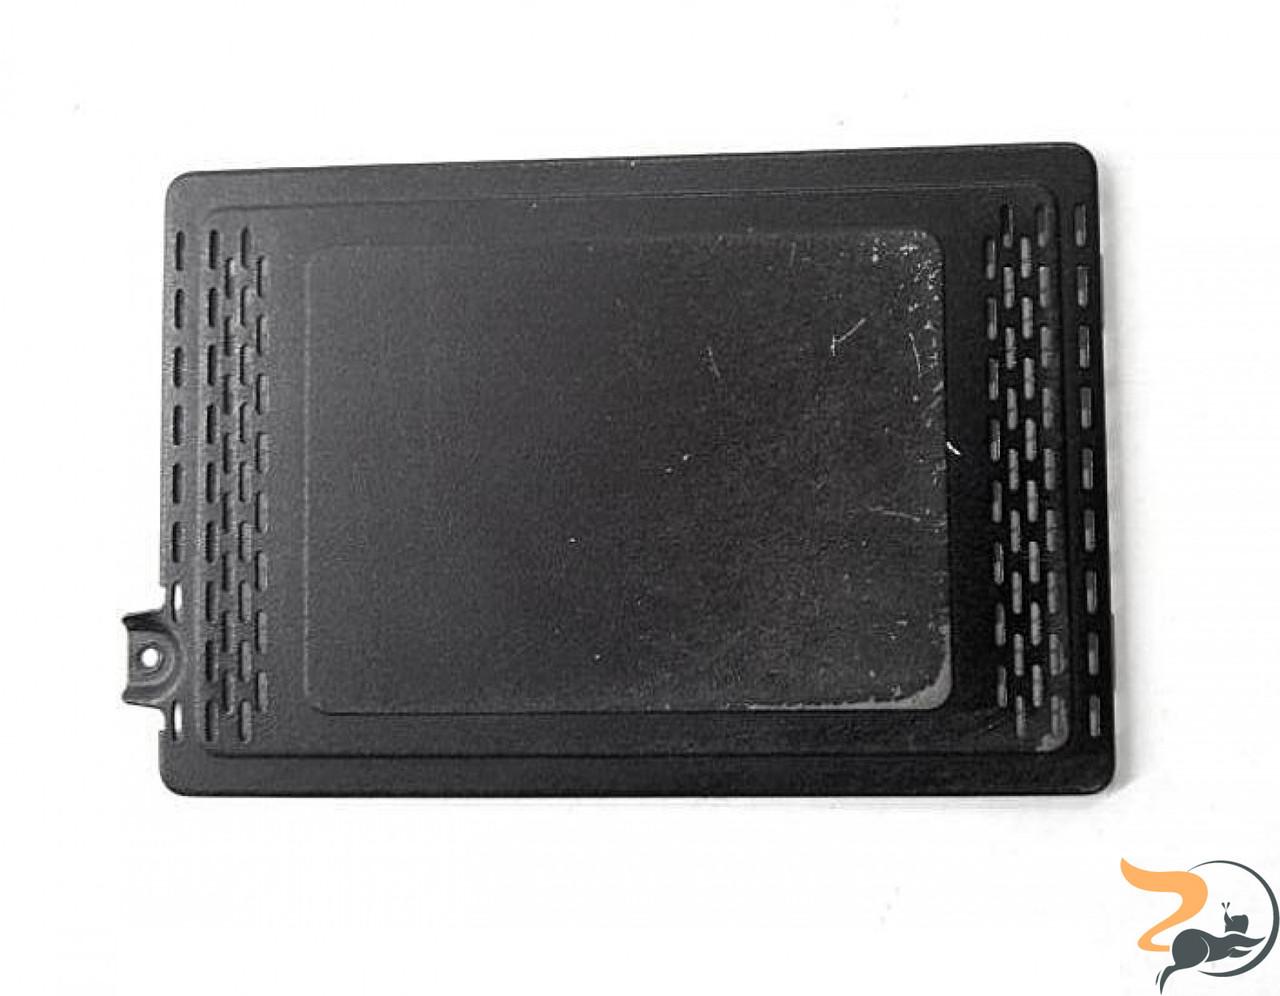 Сервісна кришка для ноутбука Asus A6, A6000, 13GNDK1AM220, Б/В